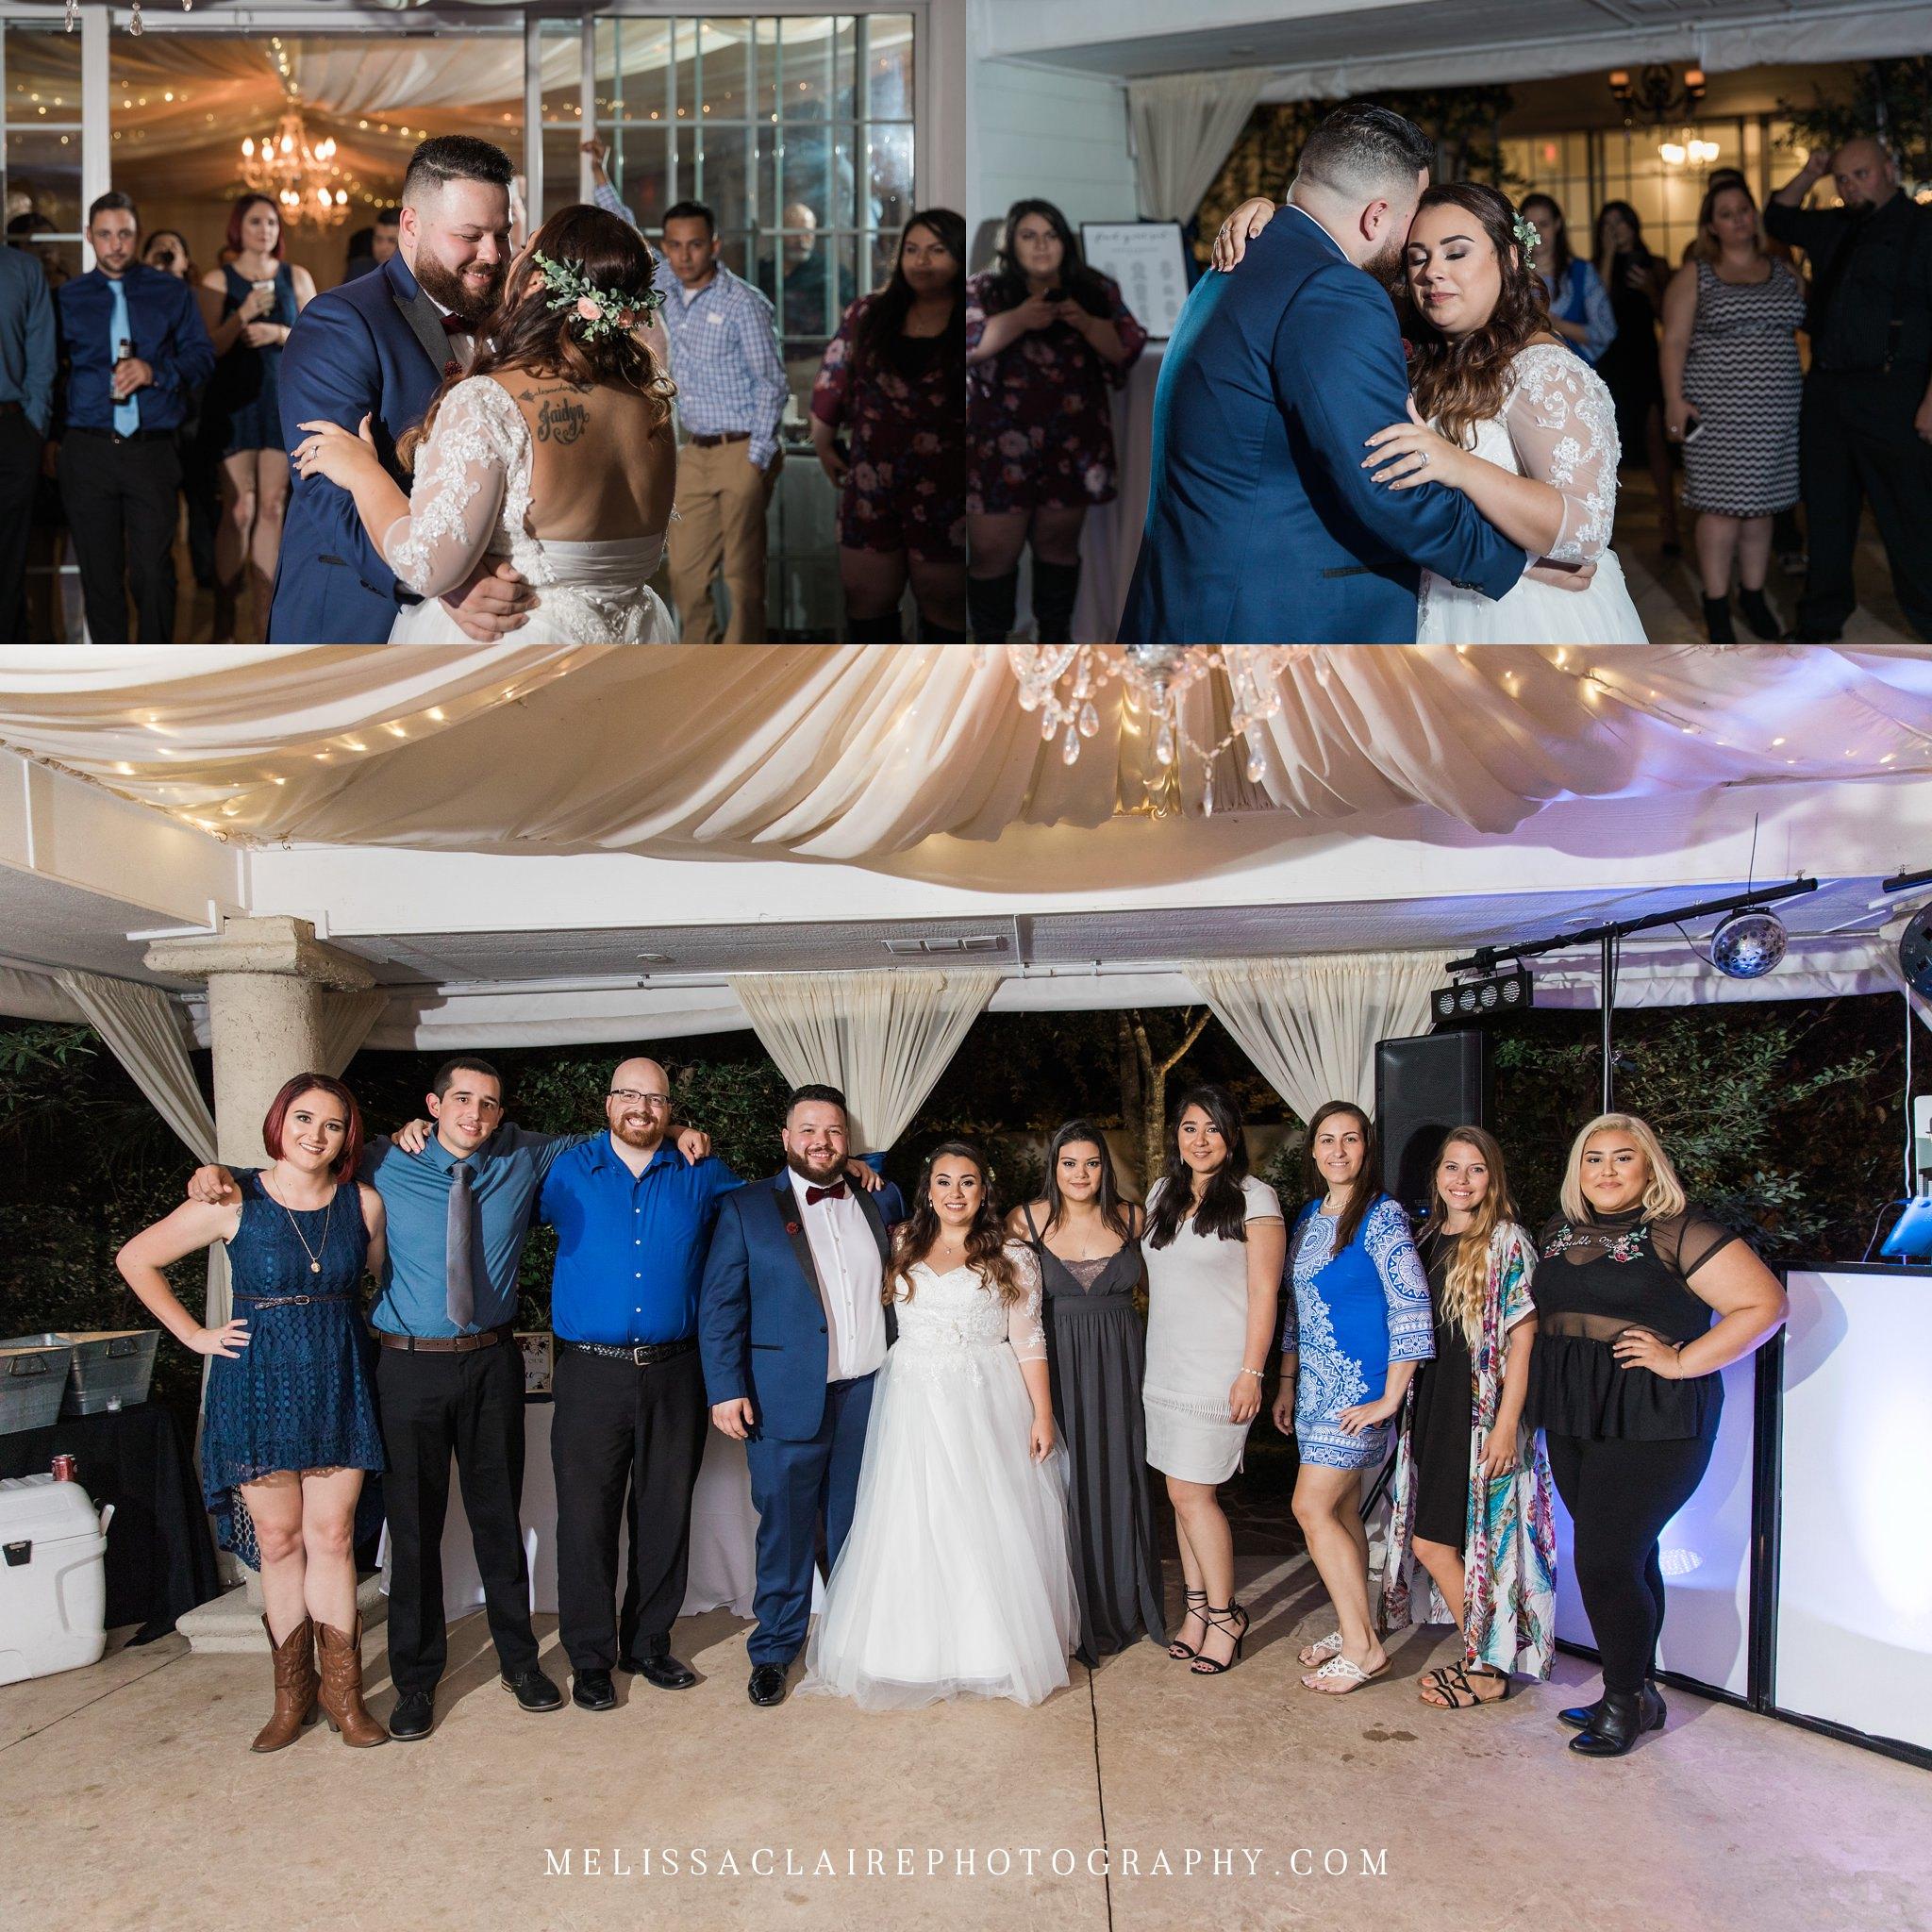 Frisco Wedding Photographer www.melissaclairephotography.com